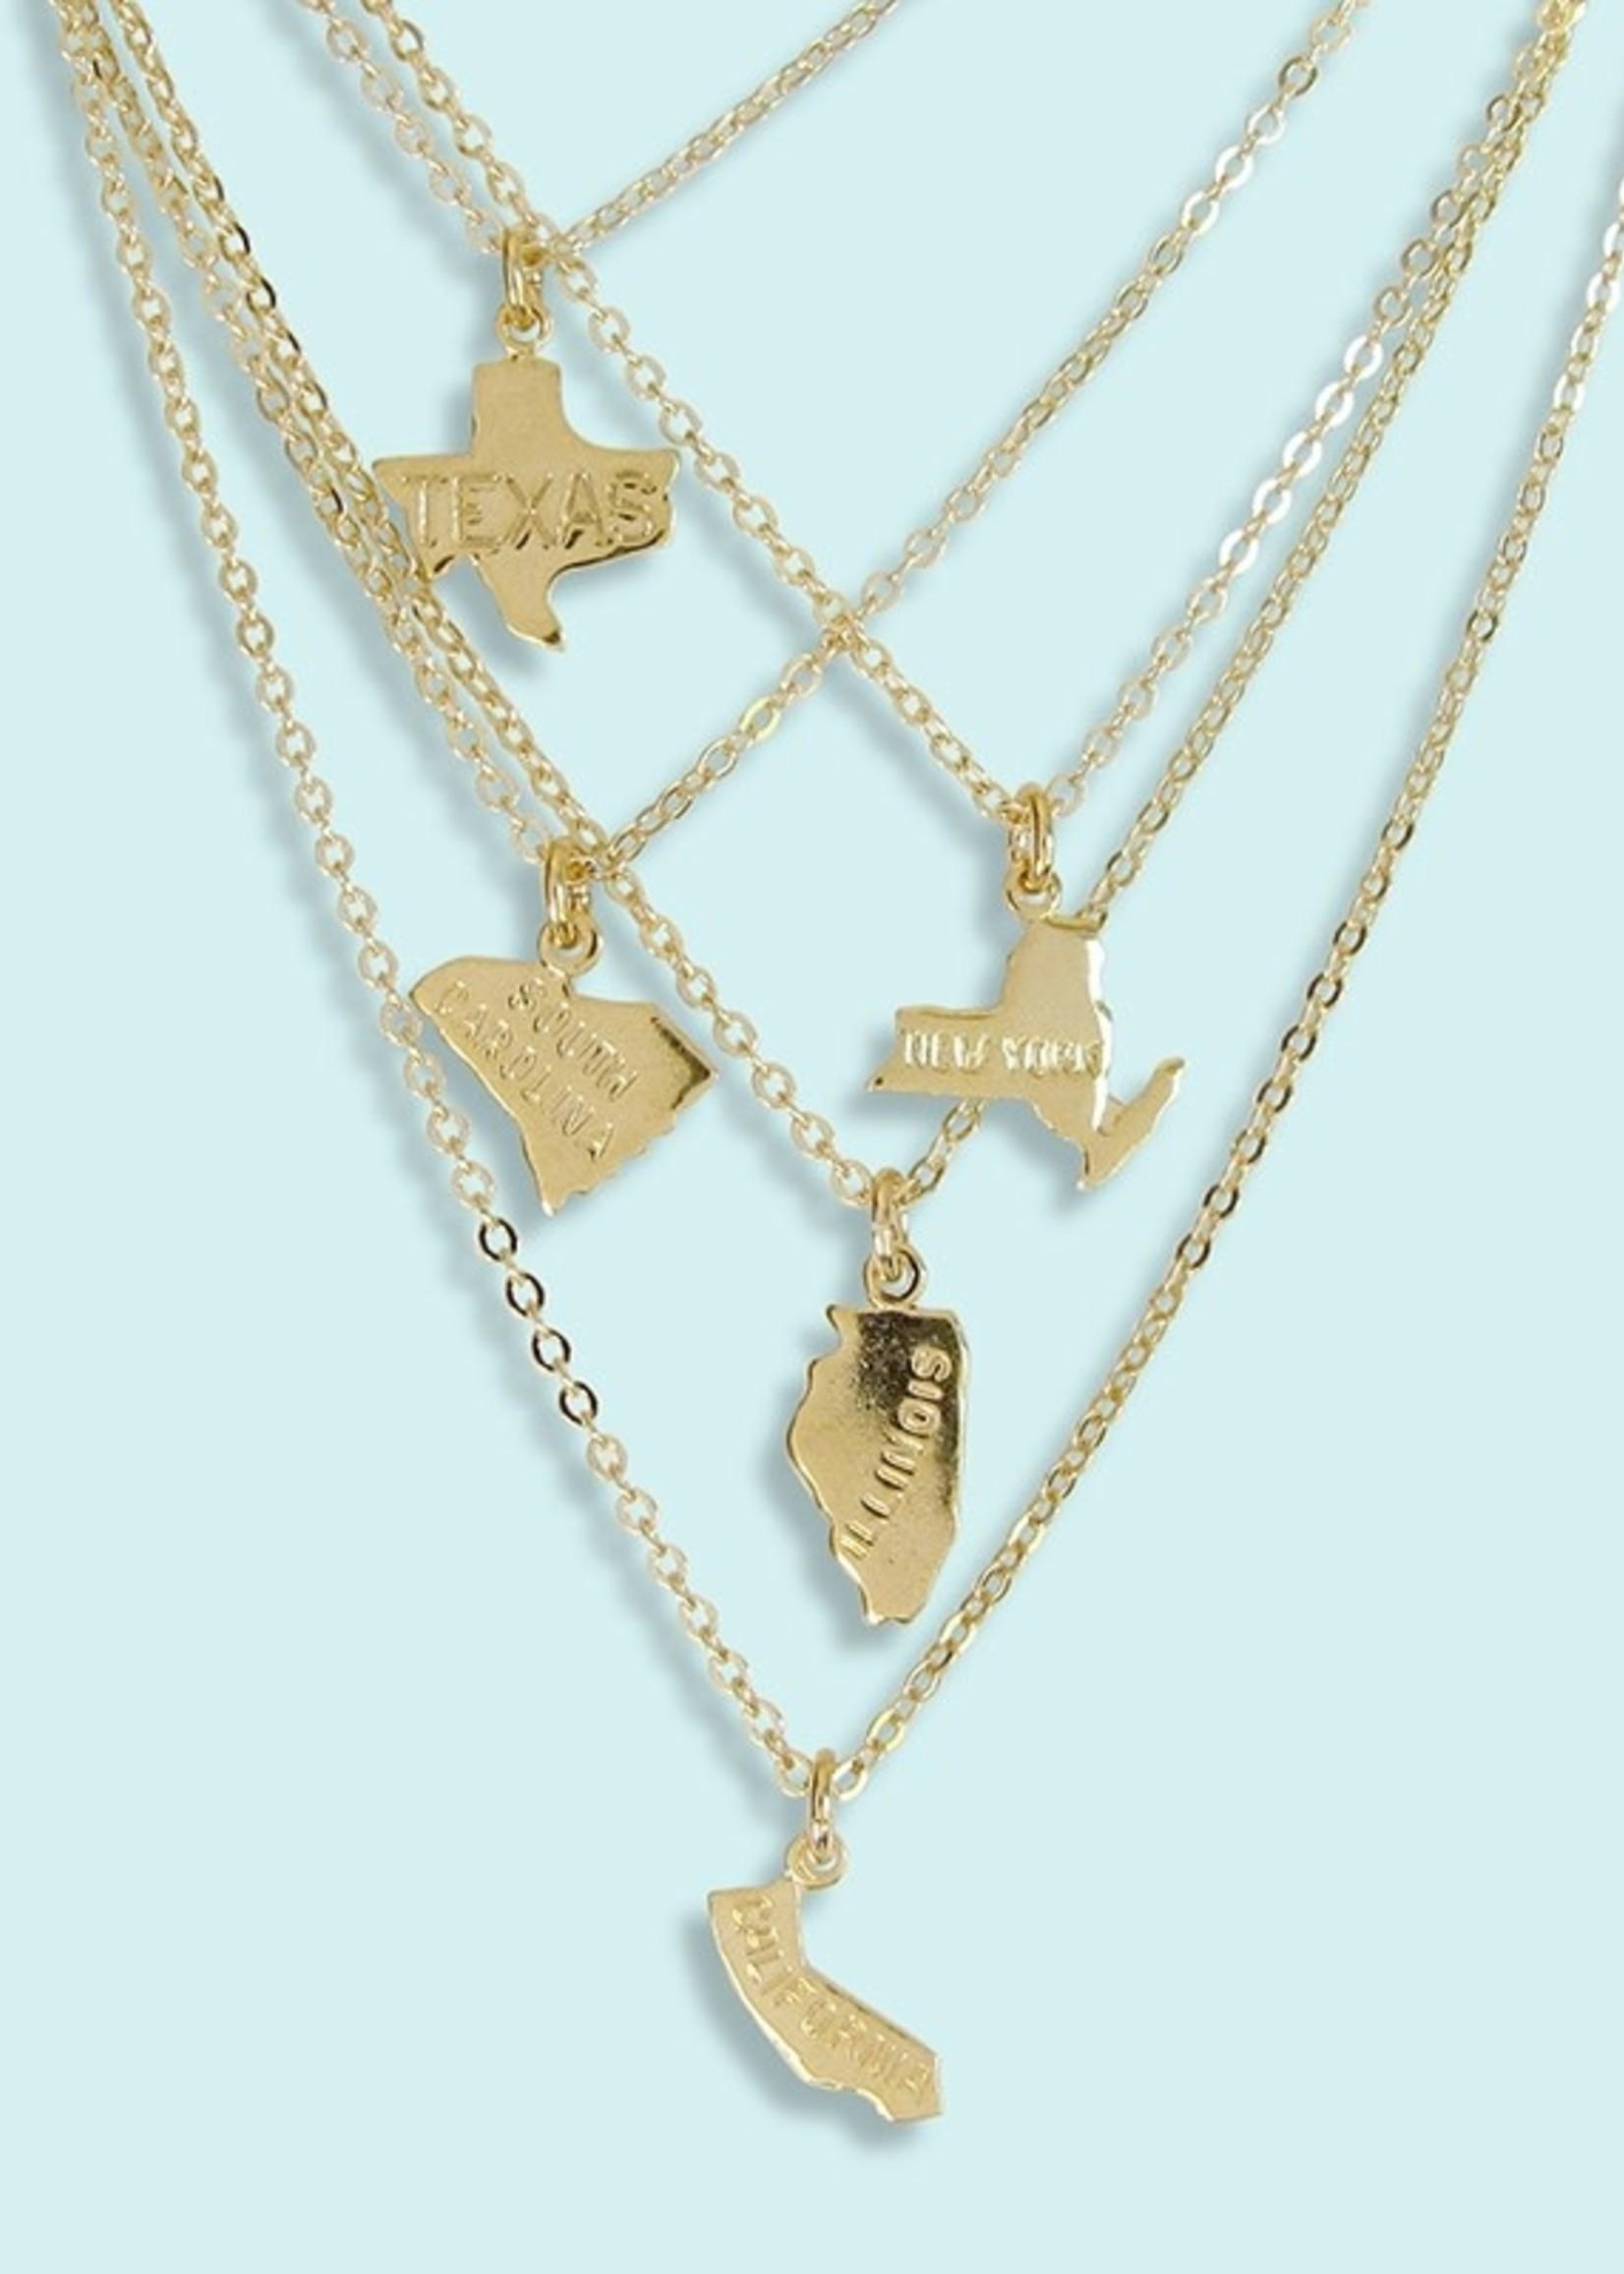 North Carolina Charm Necklace